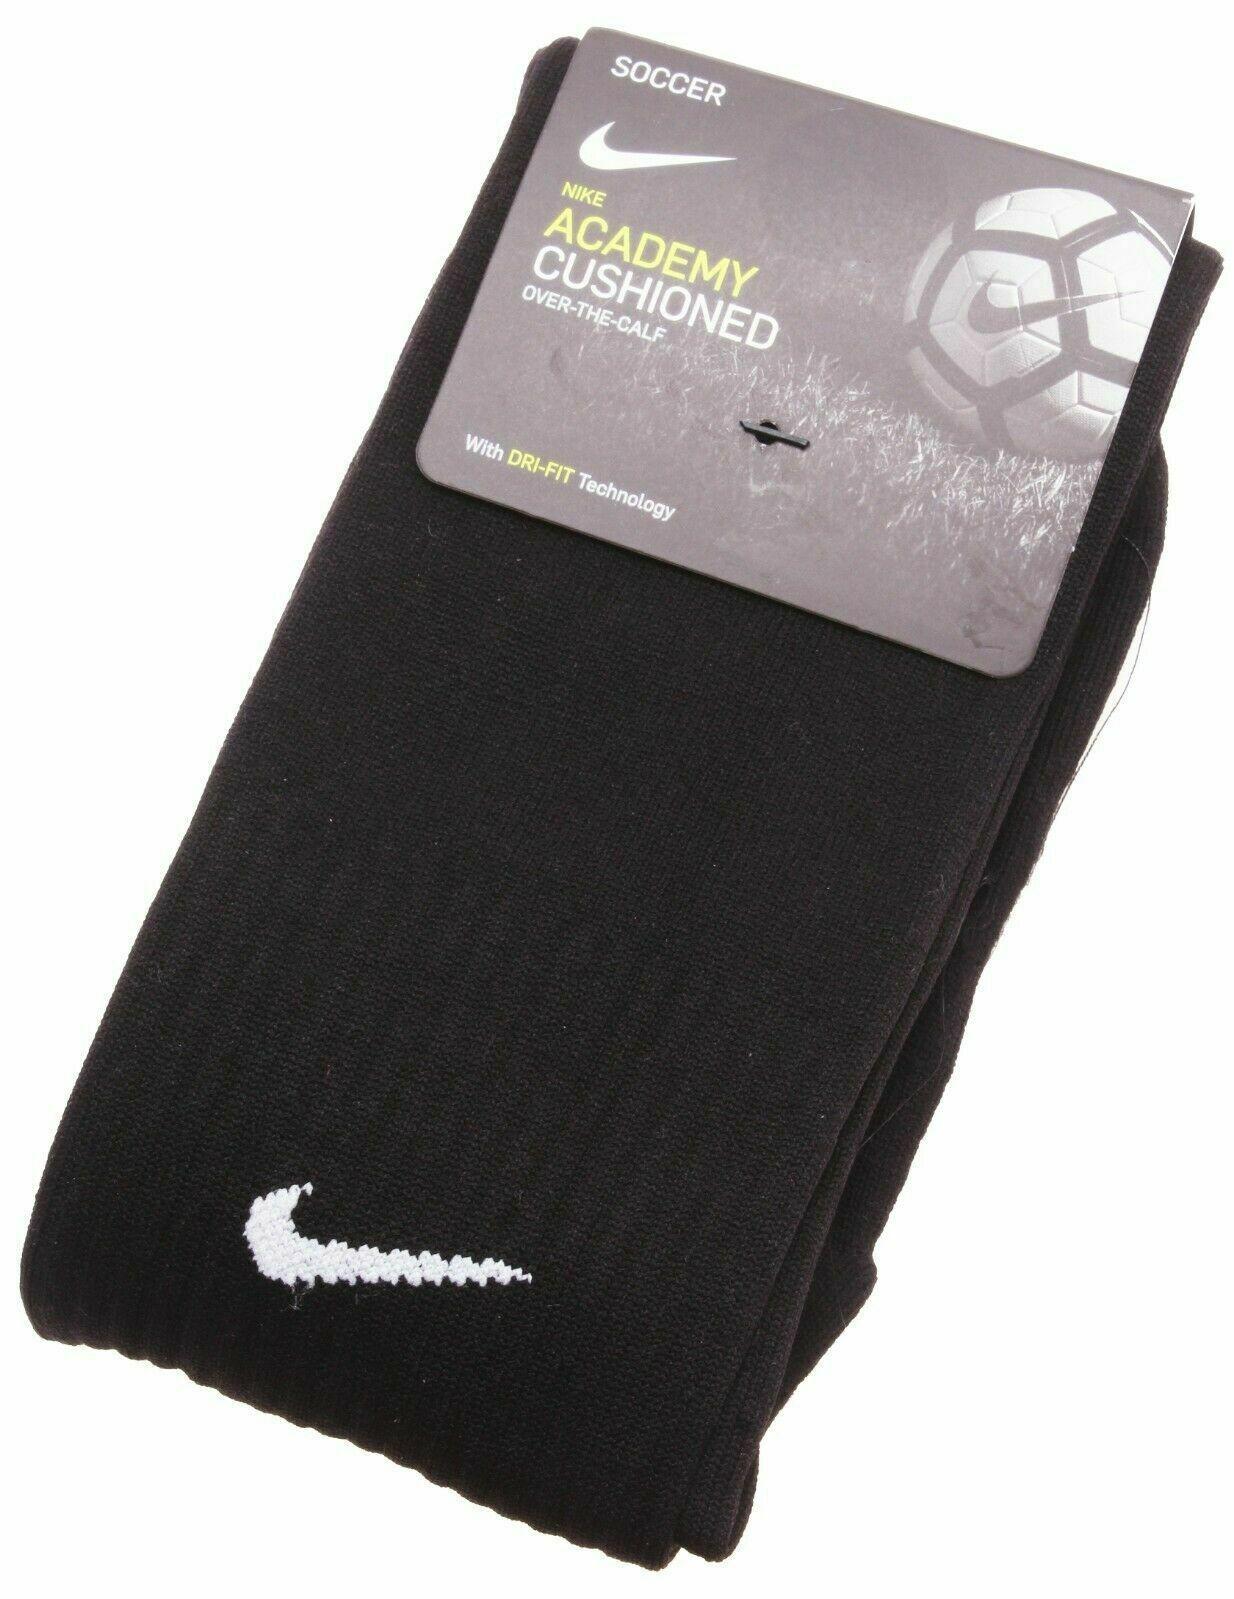 NIKE Academy Cushioned Soccer Dri-Fit OTC Socks size SM and M (Black)